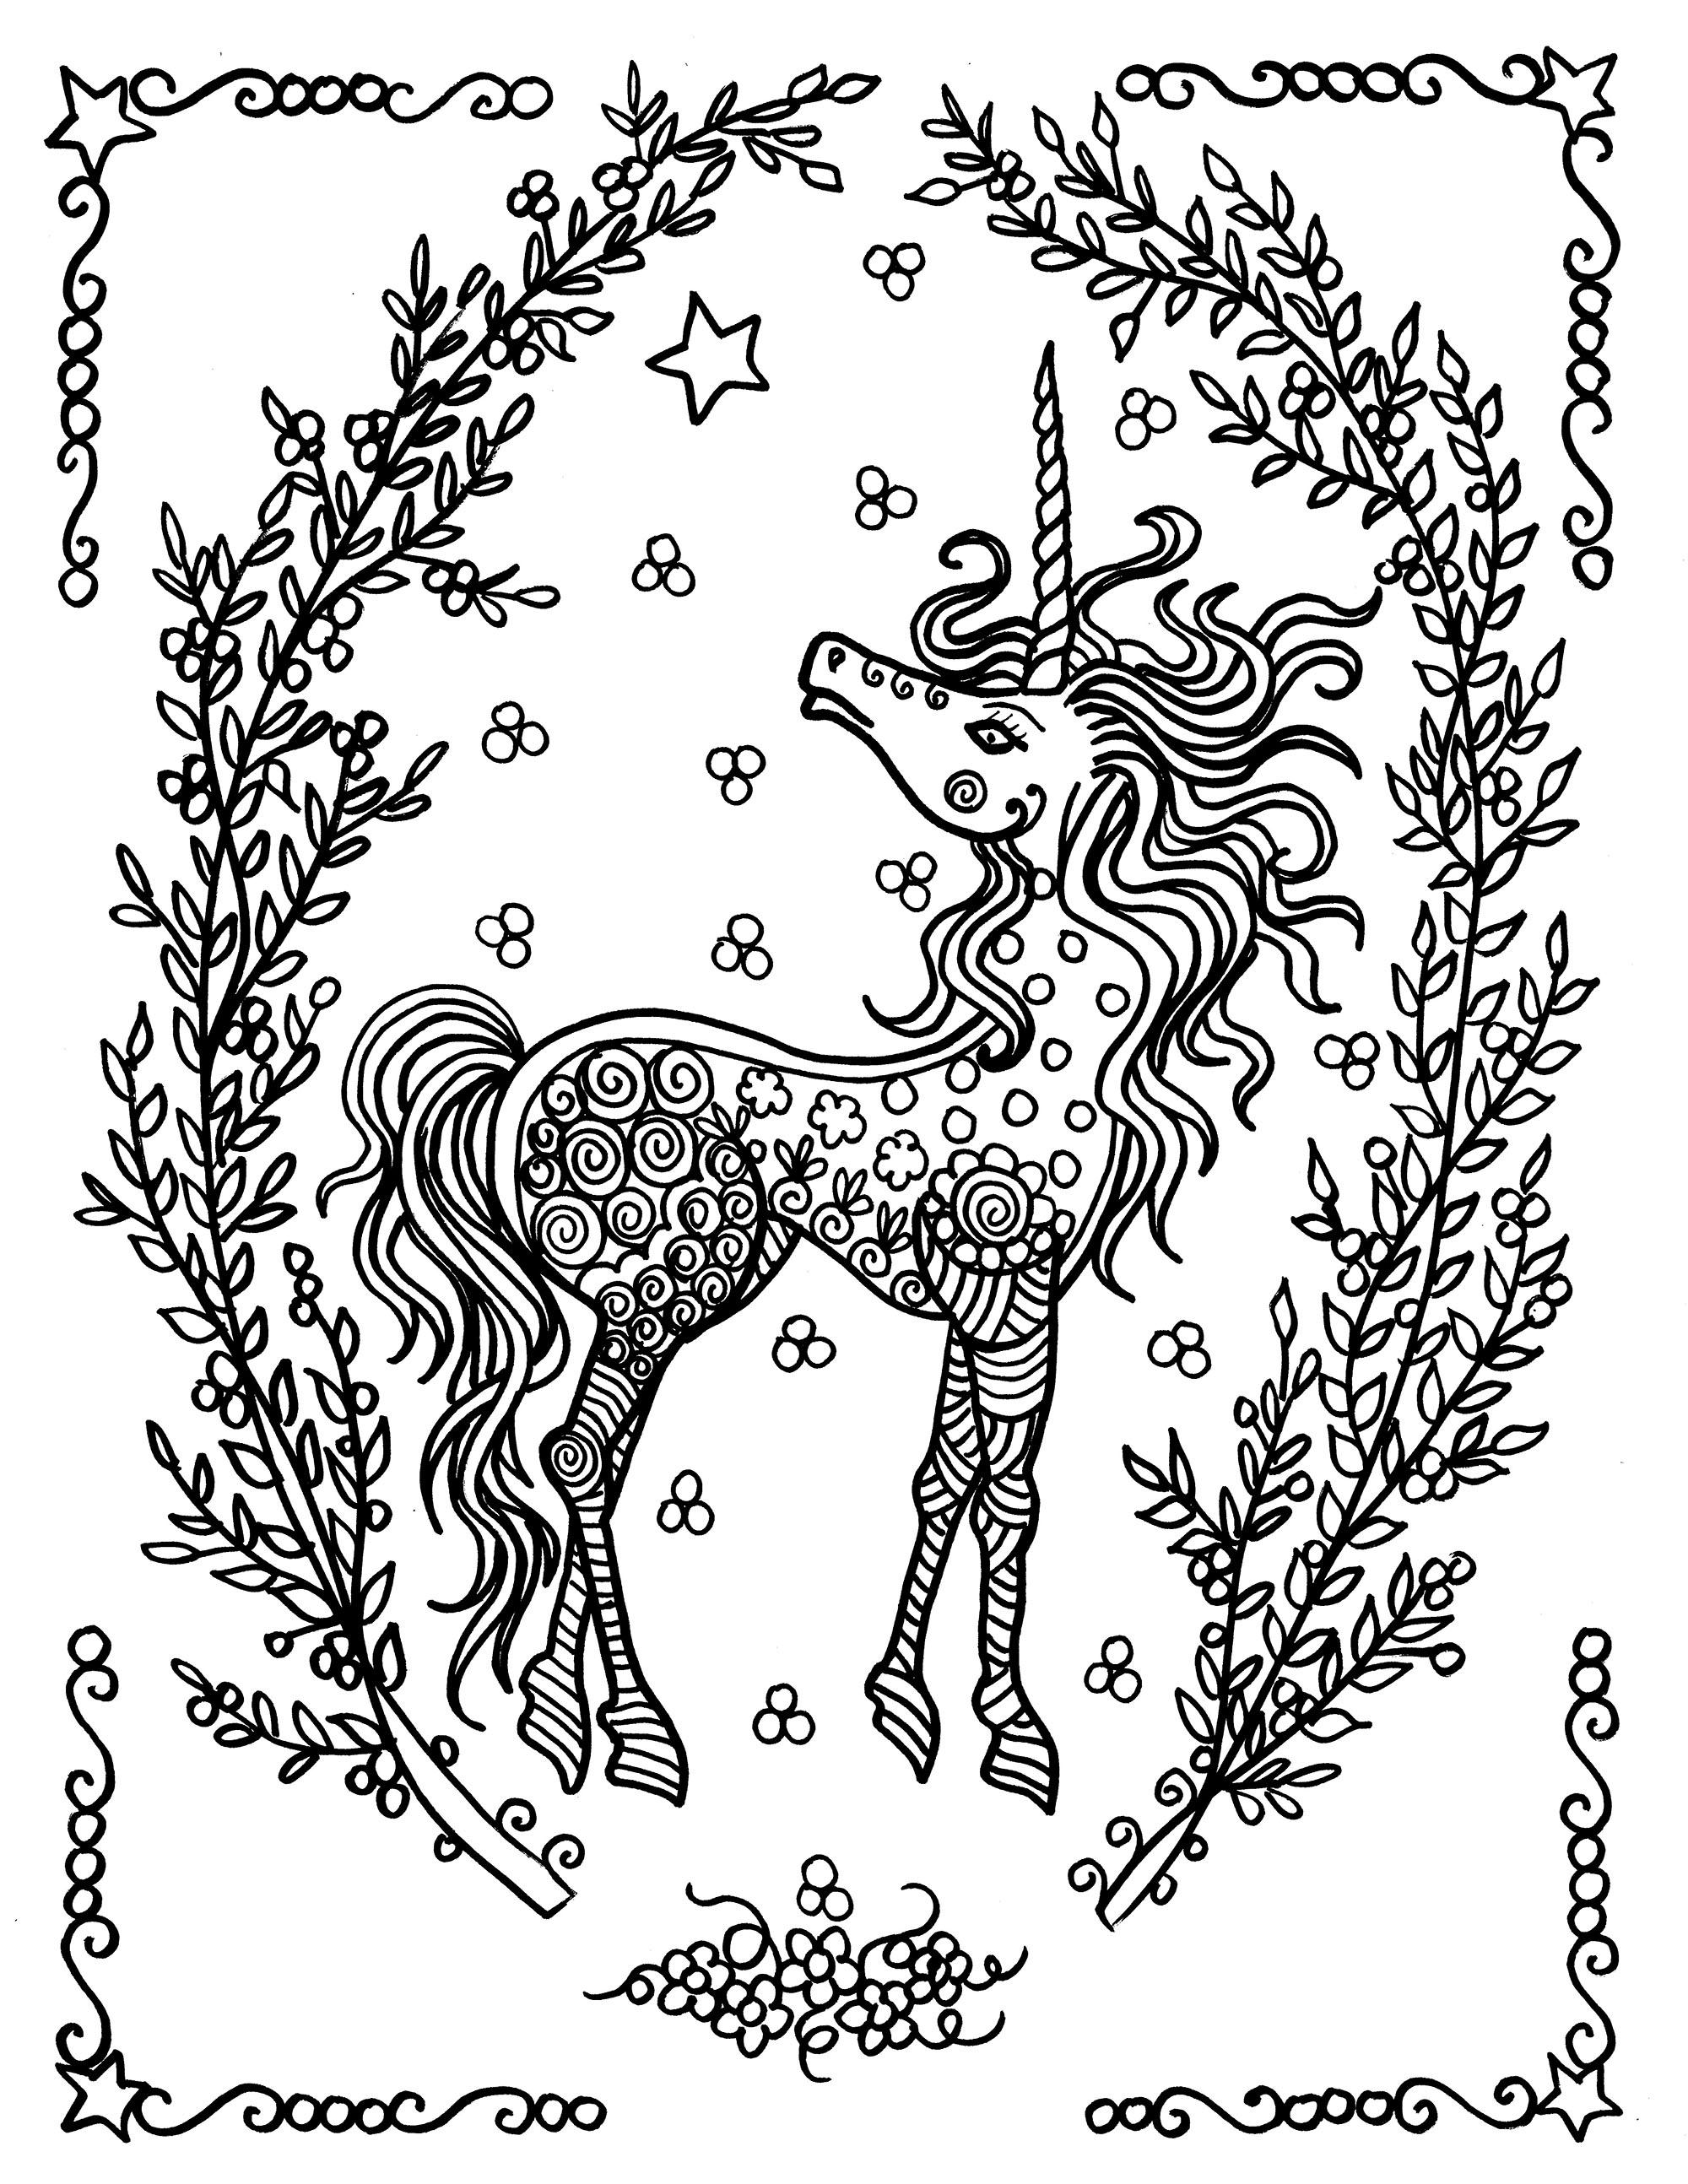 Unicorn by deborah muller - Unicorns Adult Coloring Pages